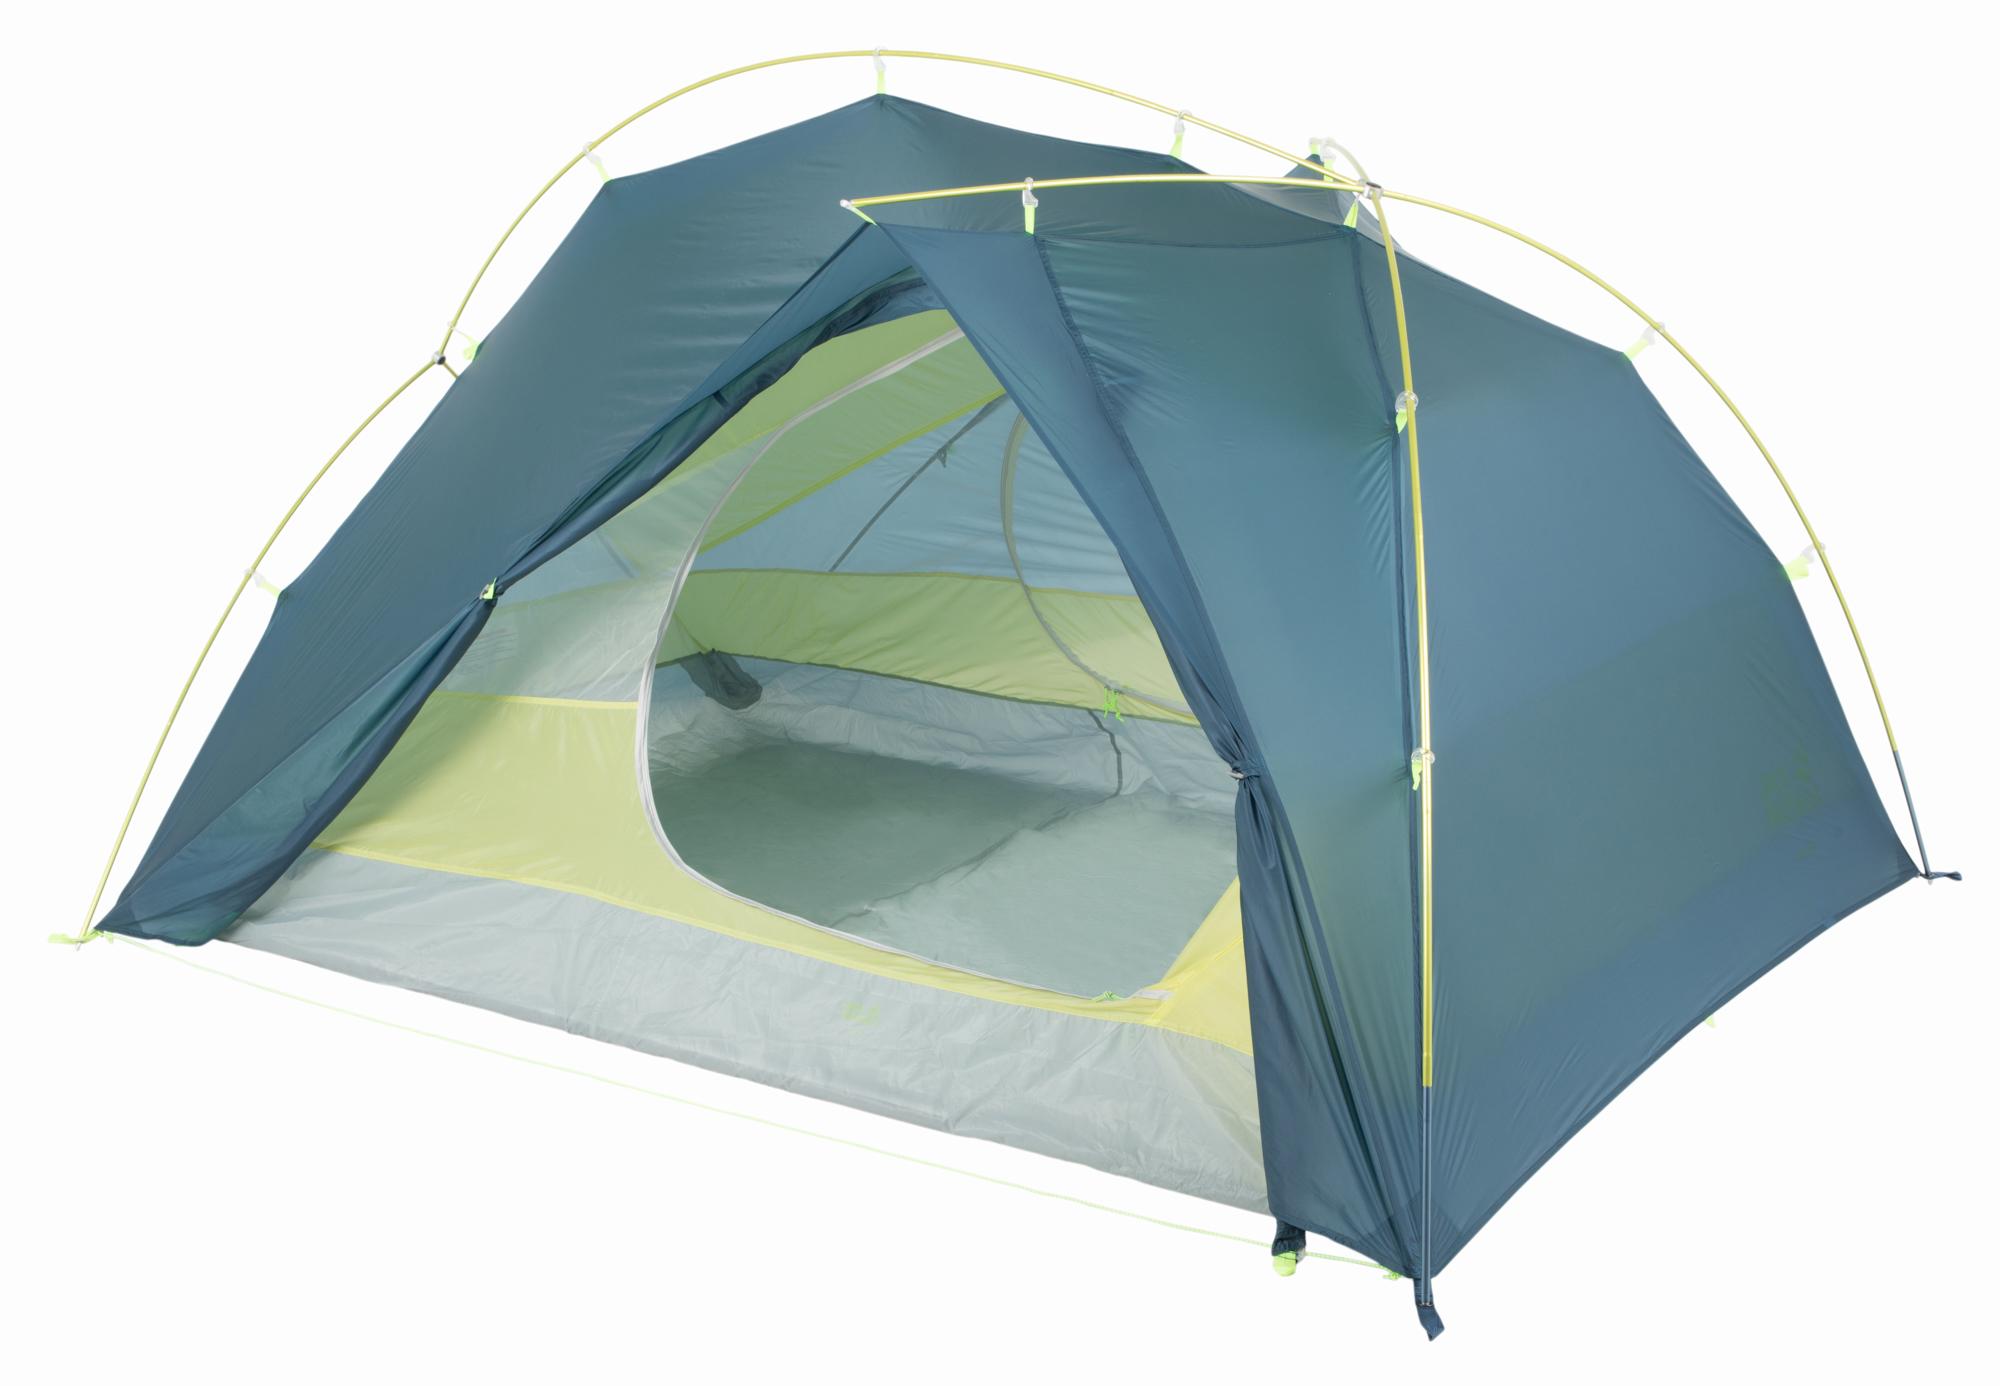 Фото - JACK WOLFSKIN Палатка 3-местная JACK WOLFSKIN Exolight III палатка greenhouse fct 32 трехместная